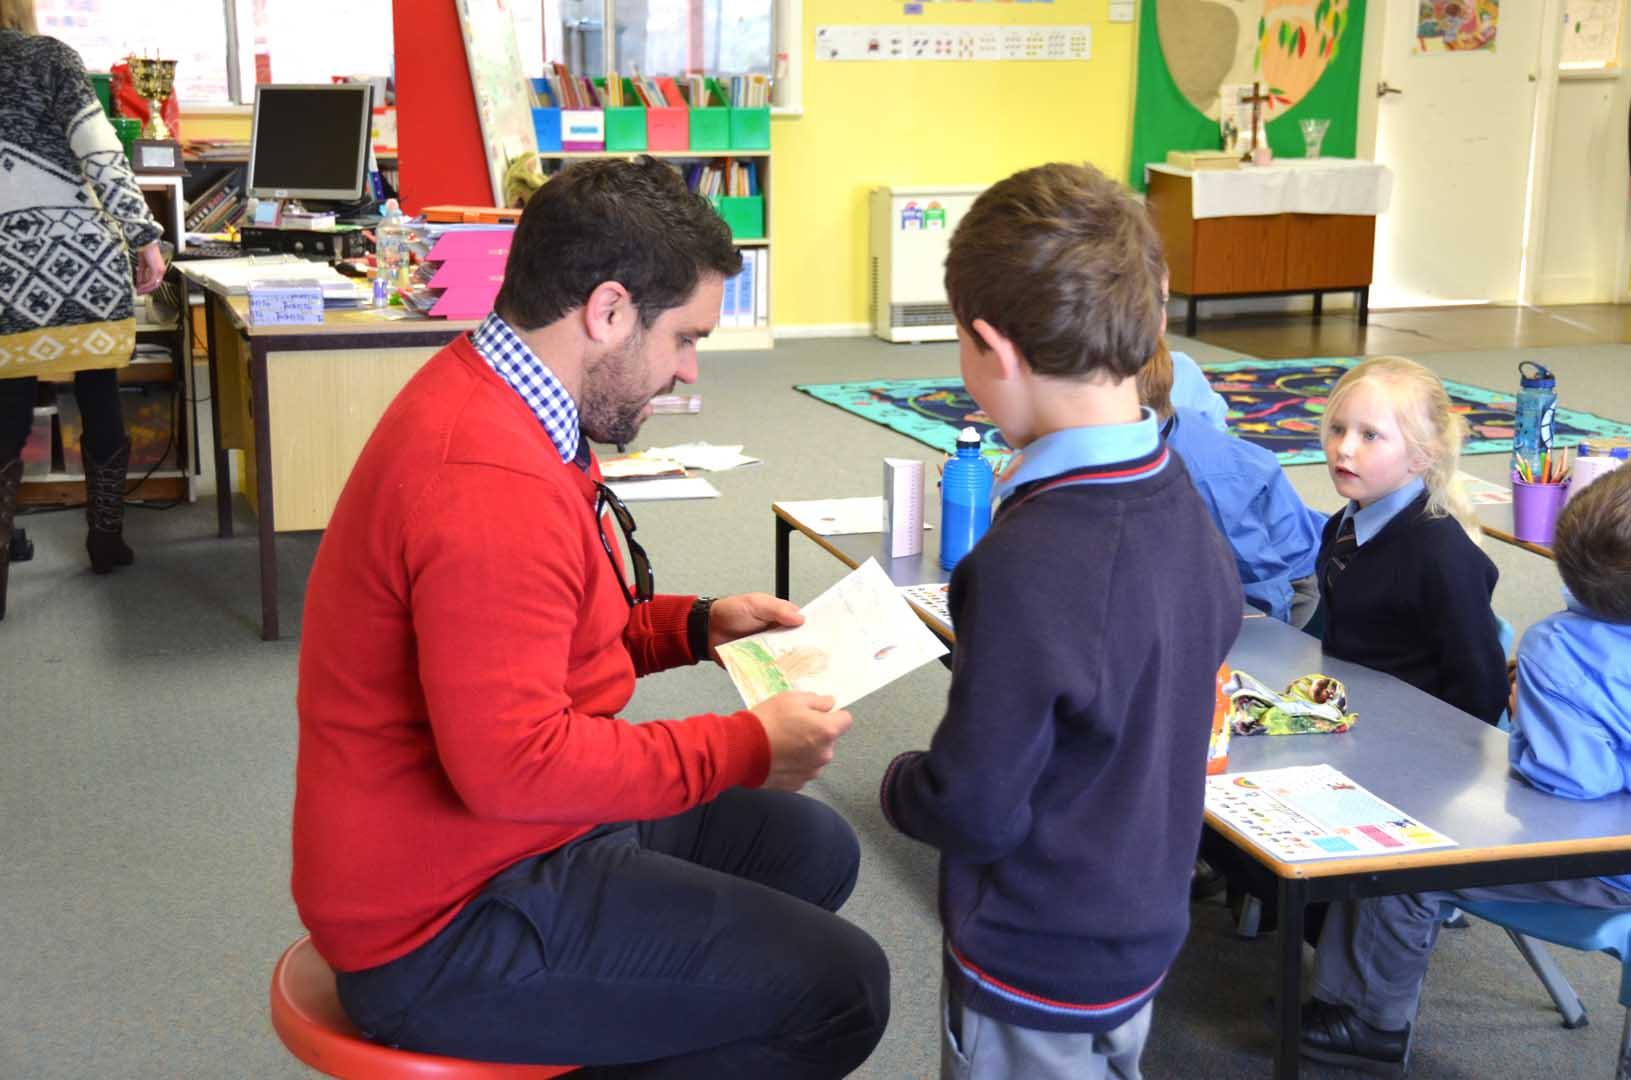 St-Patricks-walcha-classroom32155